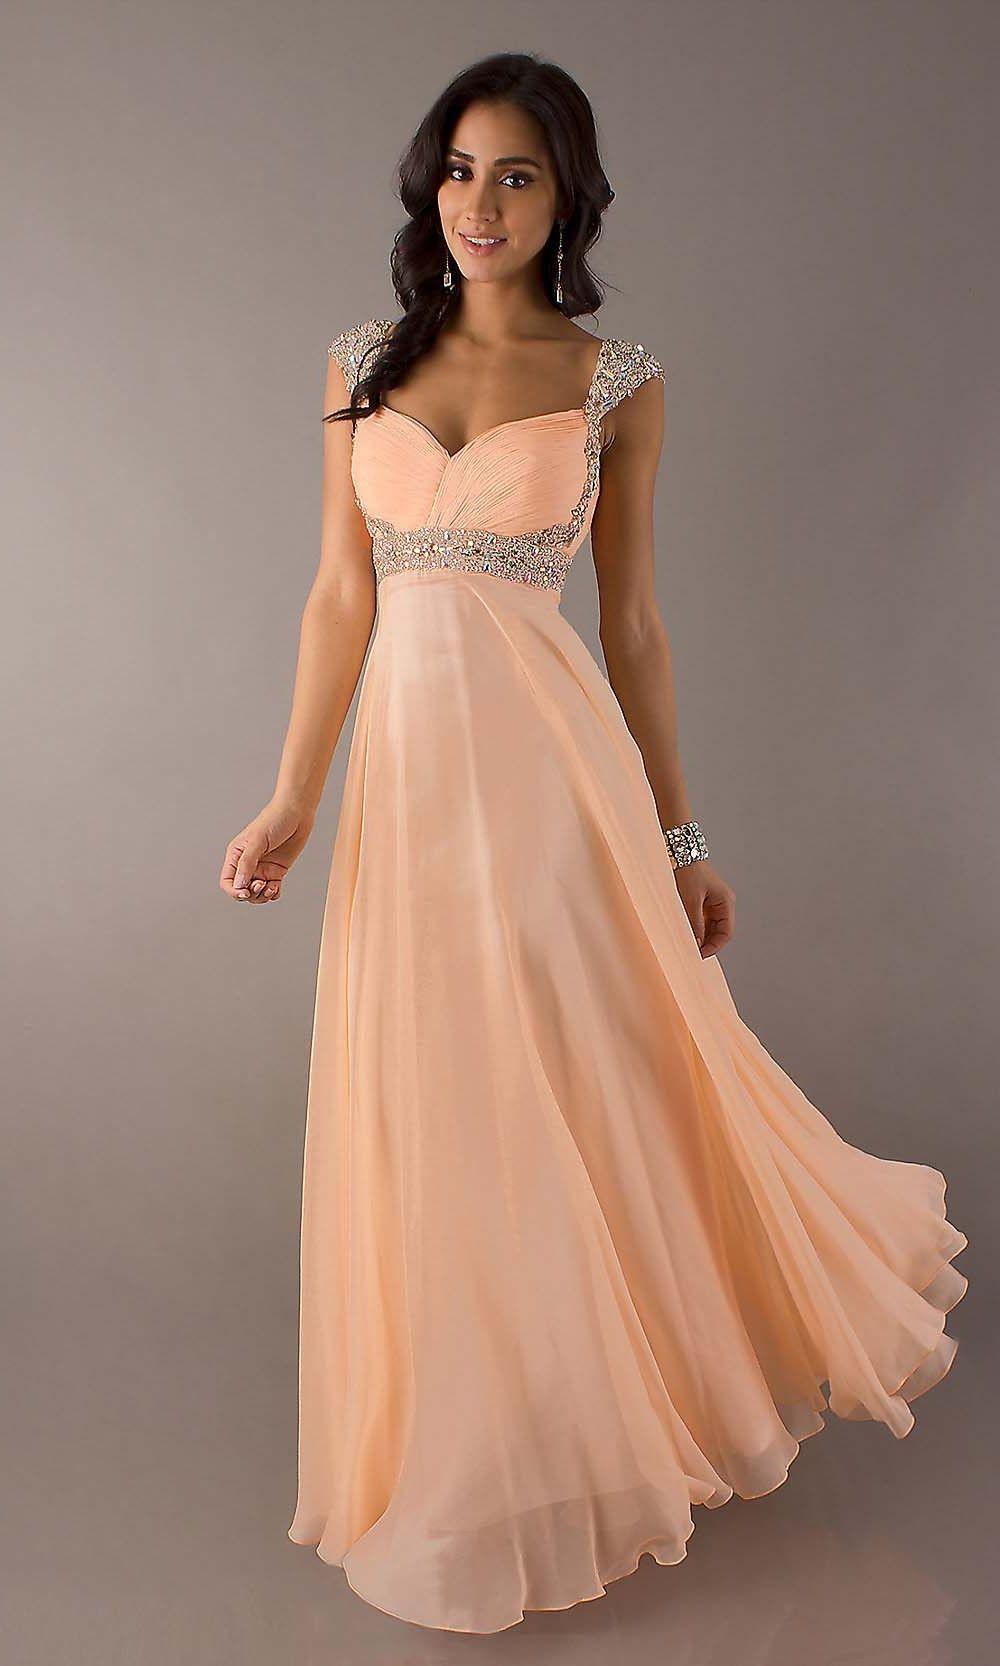 prom dresses prom dresses 2015 prom dresses short 2014 a-line ...